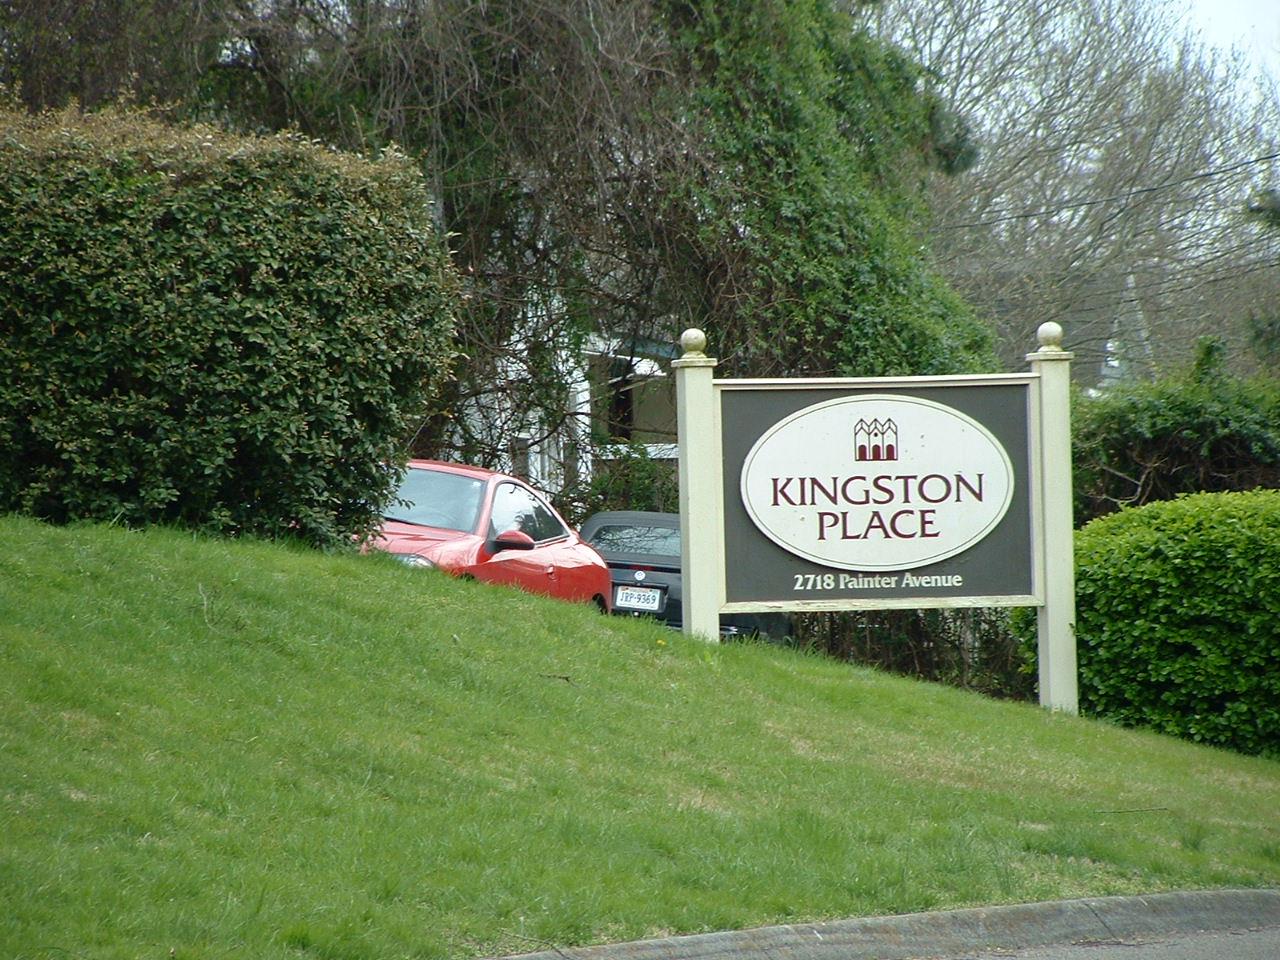 Kingston Place